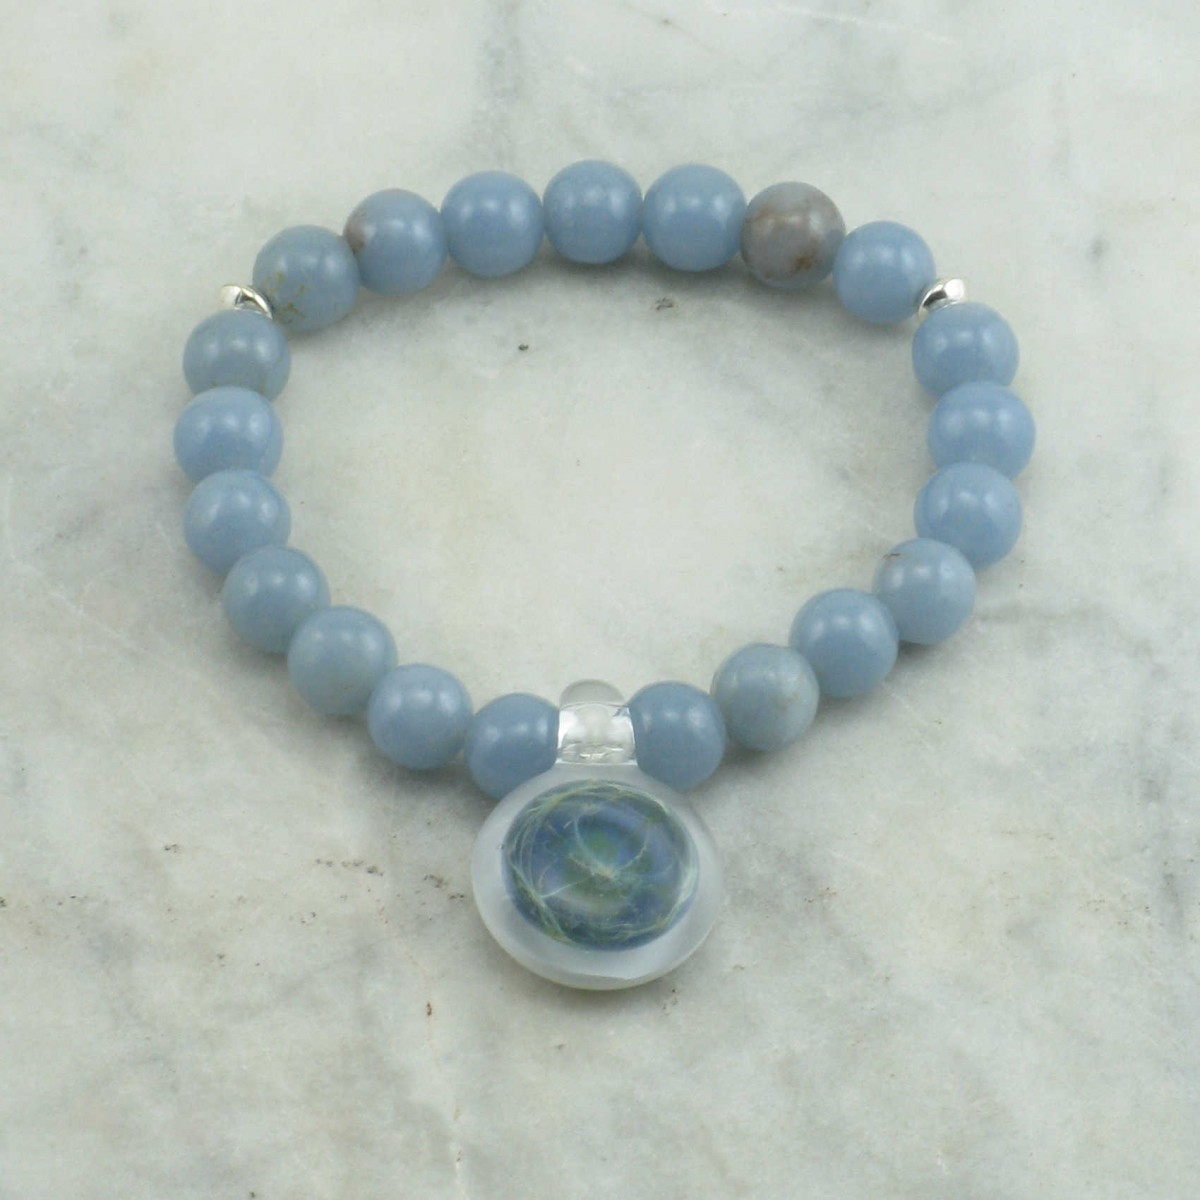 Dusk_Blue_Mala_Bracelet_21_Angelite_Mala_Beads